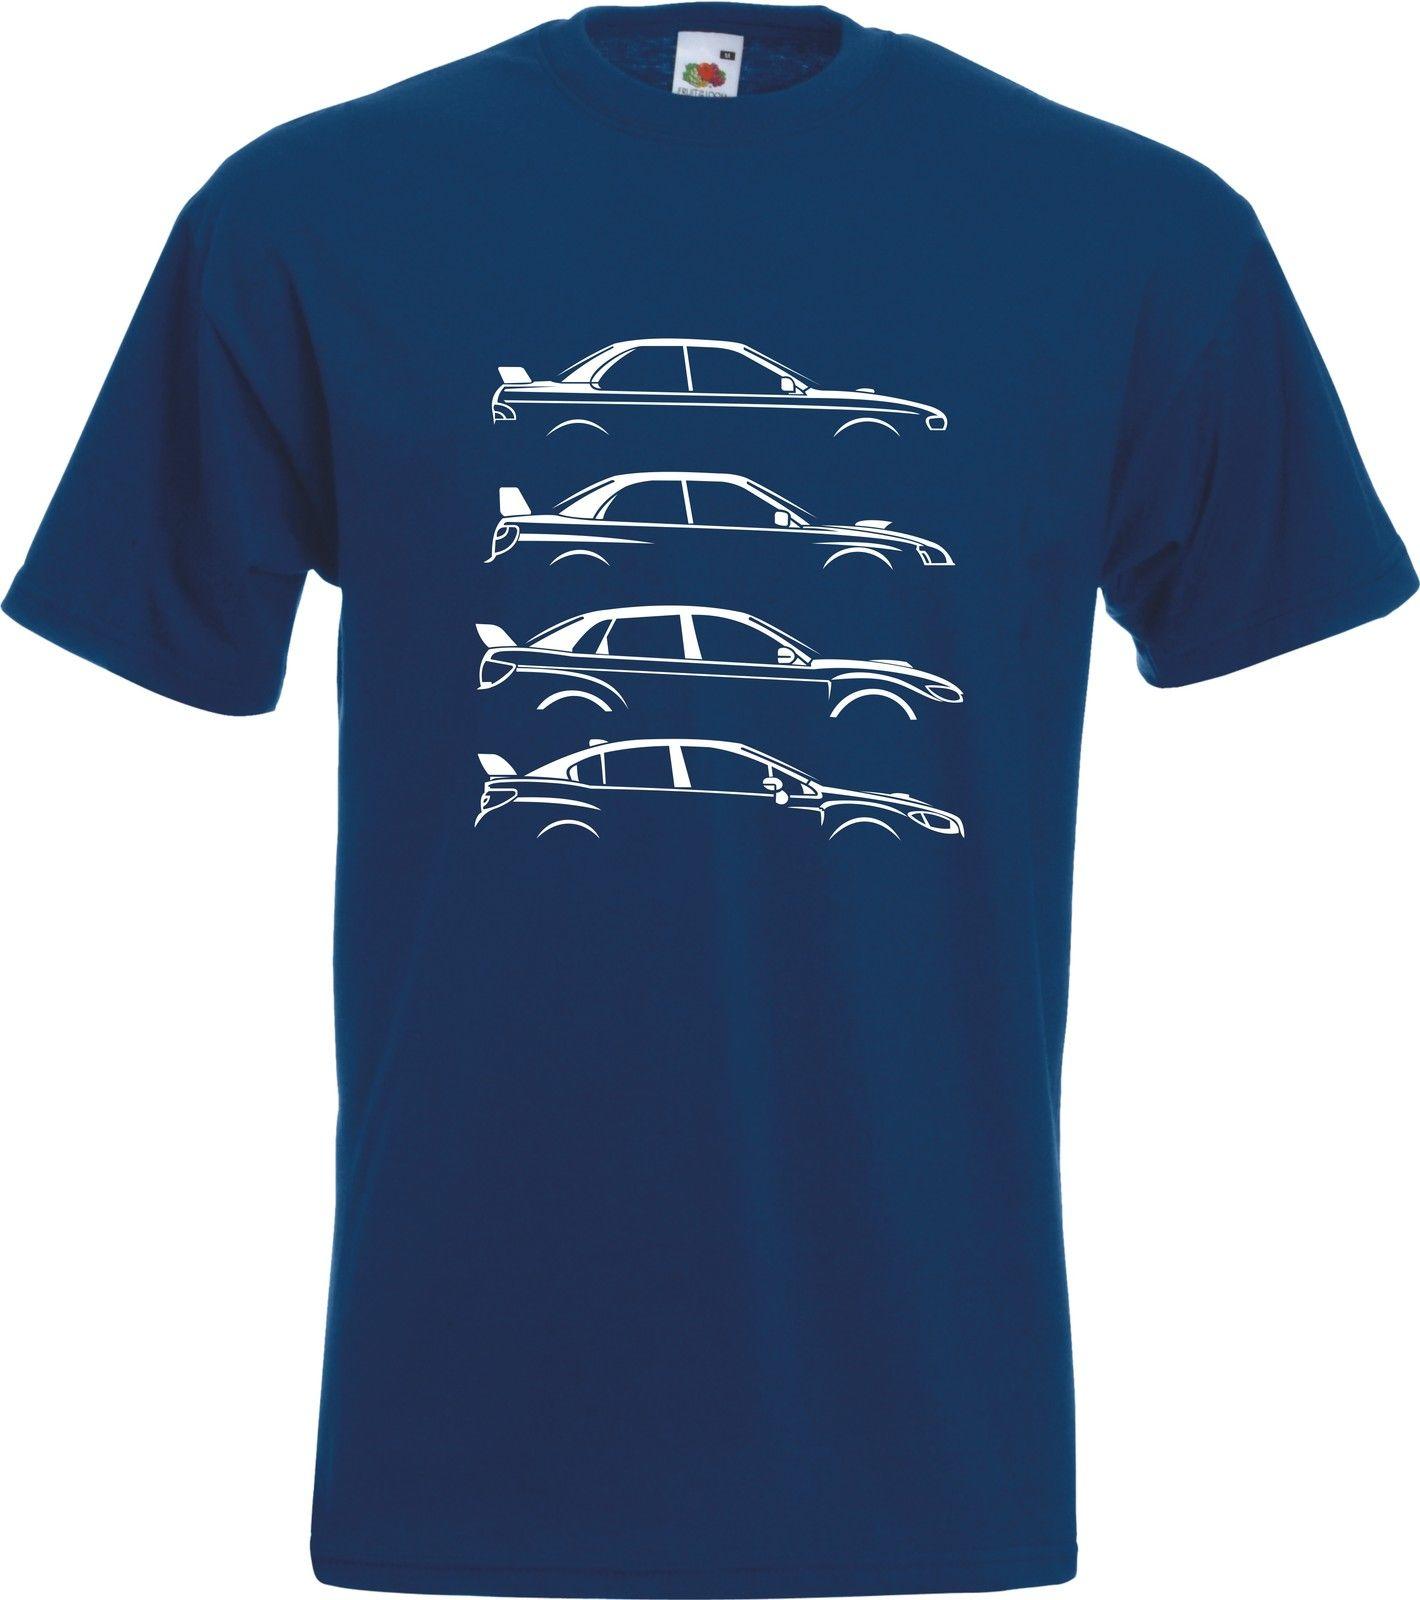 Evolution of Skyline GTR inspired Car Silhouette Hoodie Hooded Top